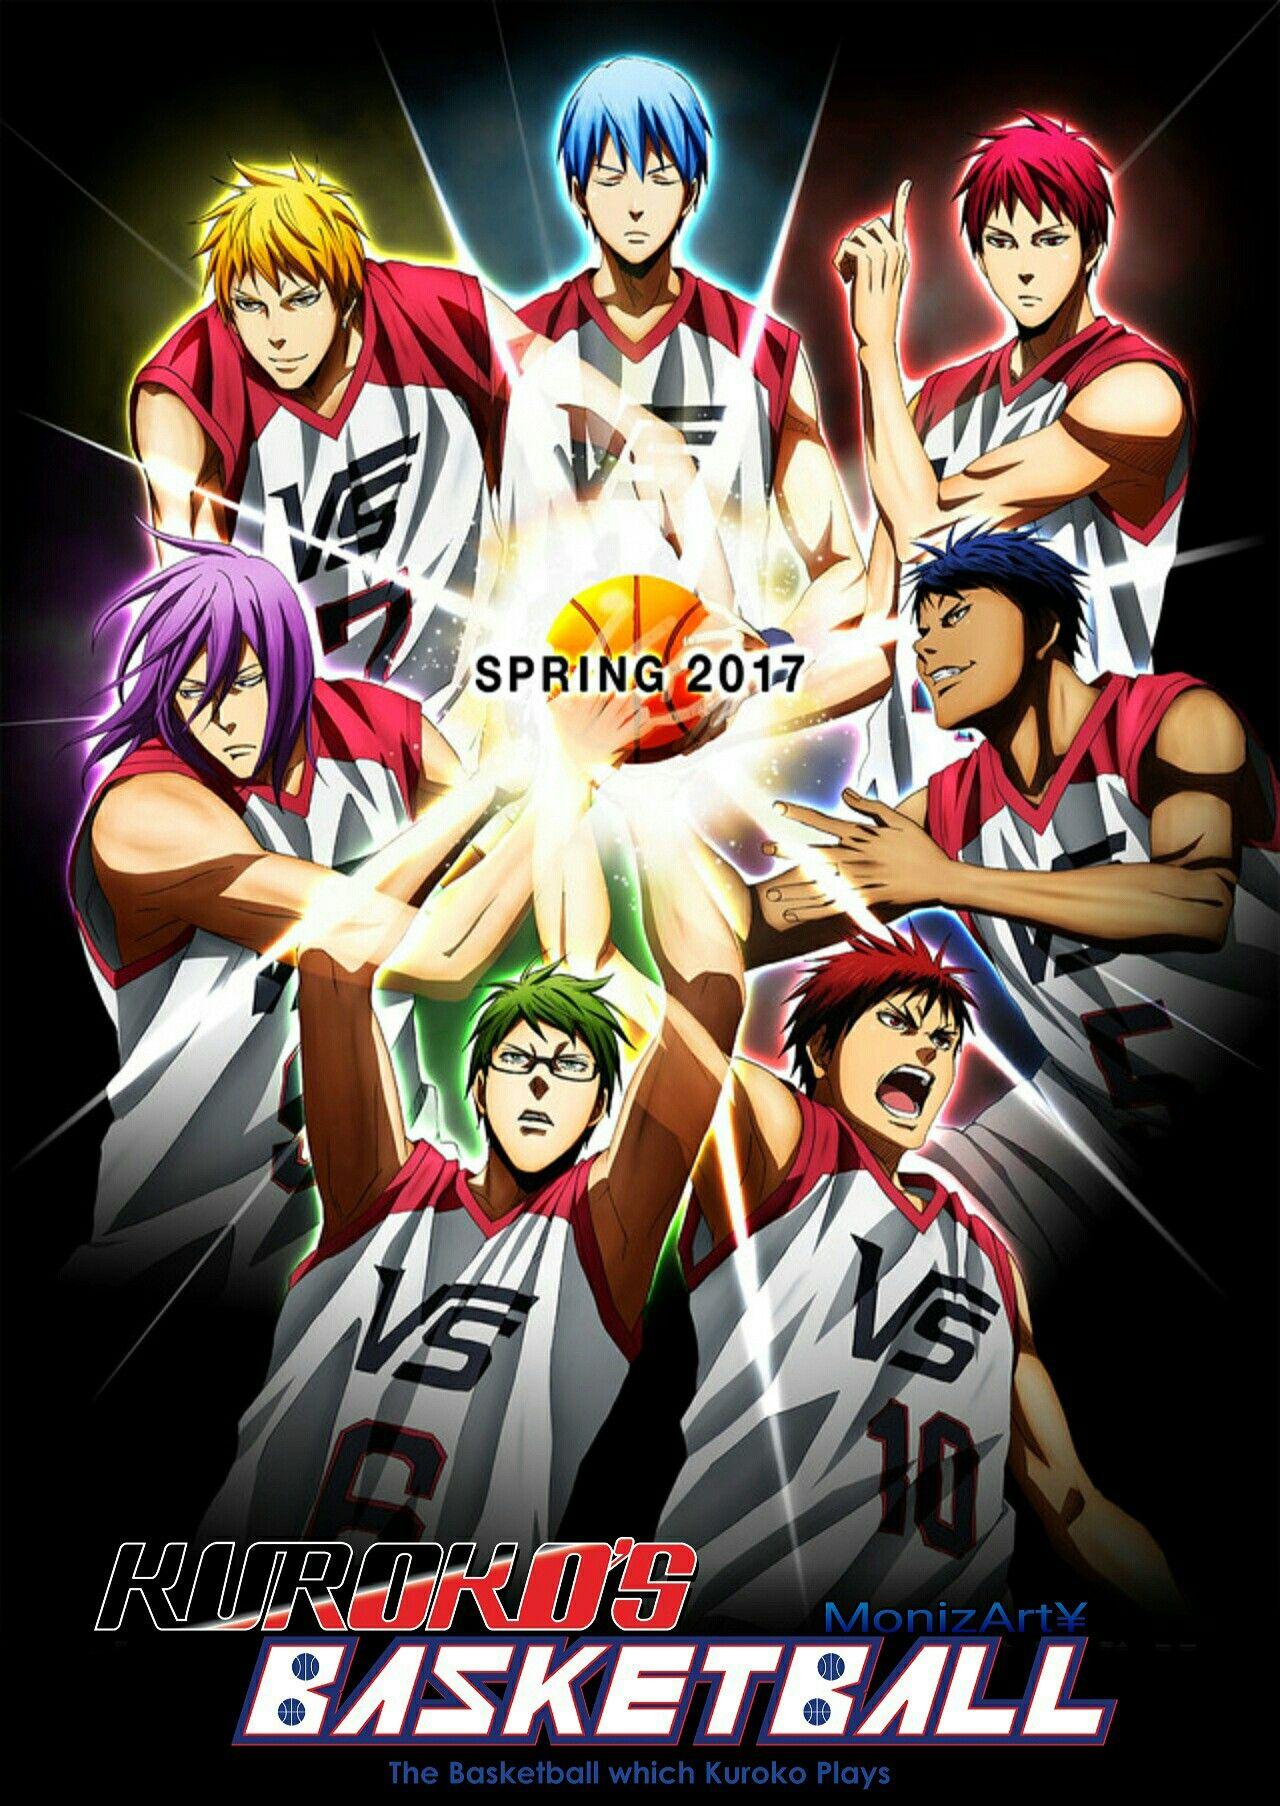 Kuroko No Basket Last Game Wallpaper 1080p By Monizart Kuroko Pahlawan Marvel Gambar